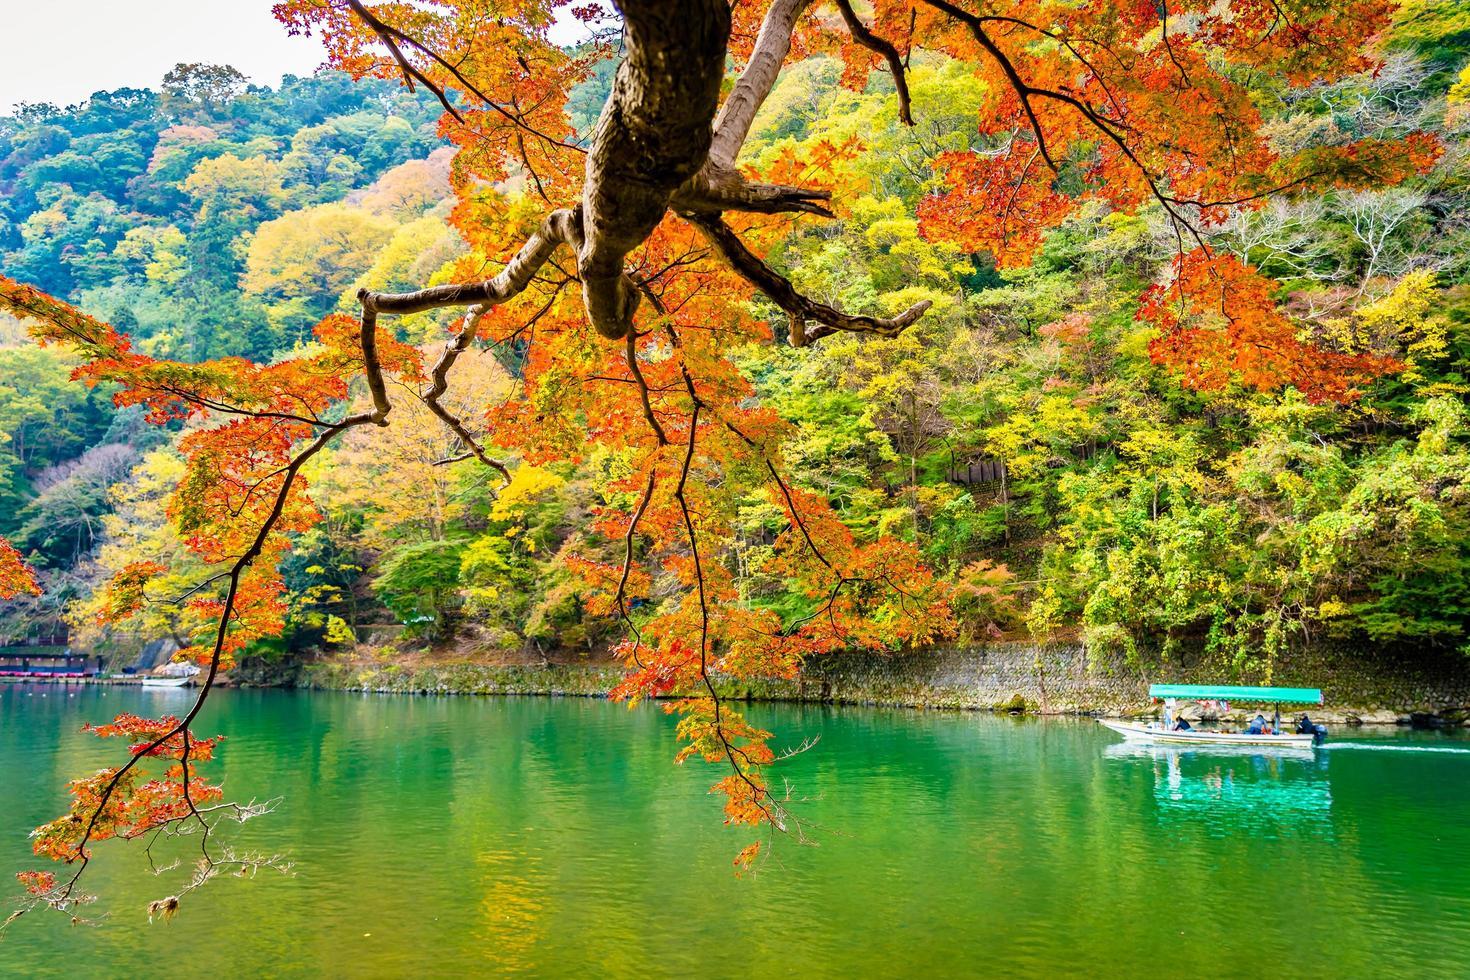 prachtige arashiyama-rivier in kyoto, japan foto